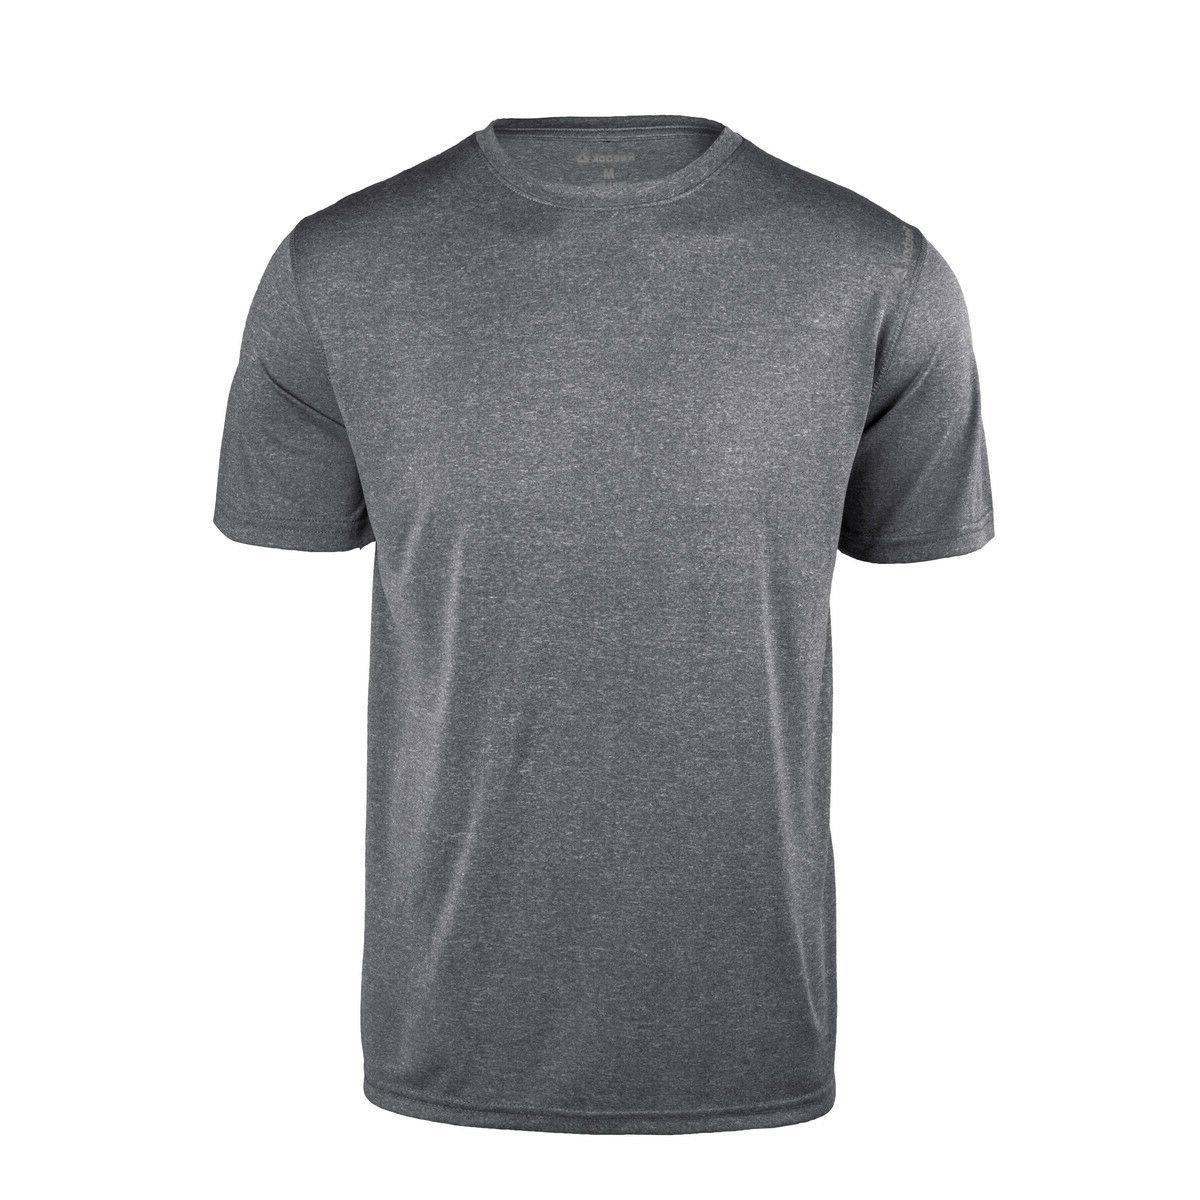 Reebok dri-fit T-shirt Work out Gym S-3XL, 4XL Sport